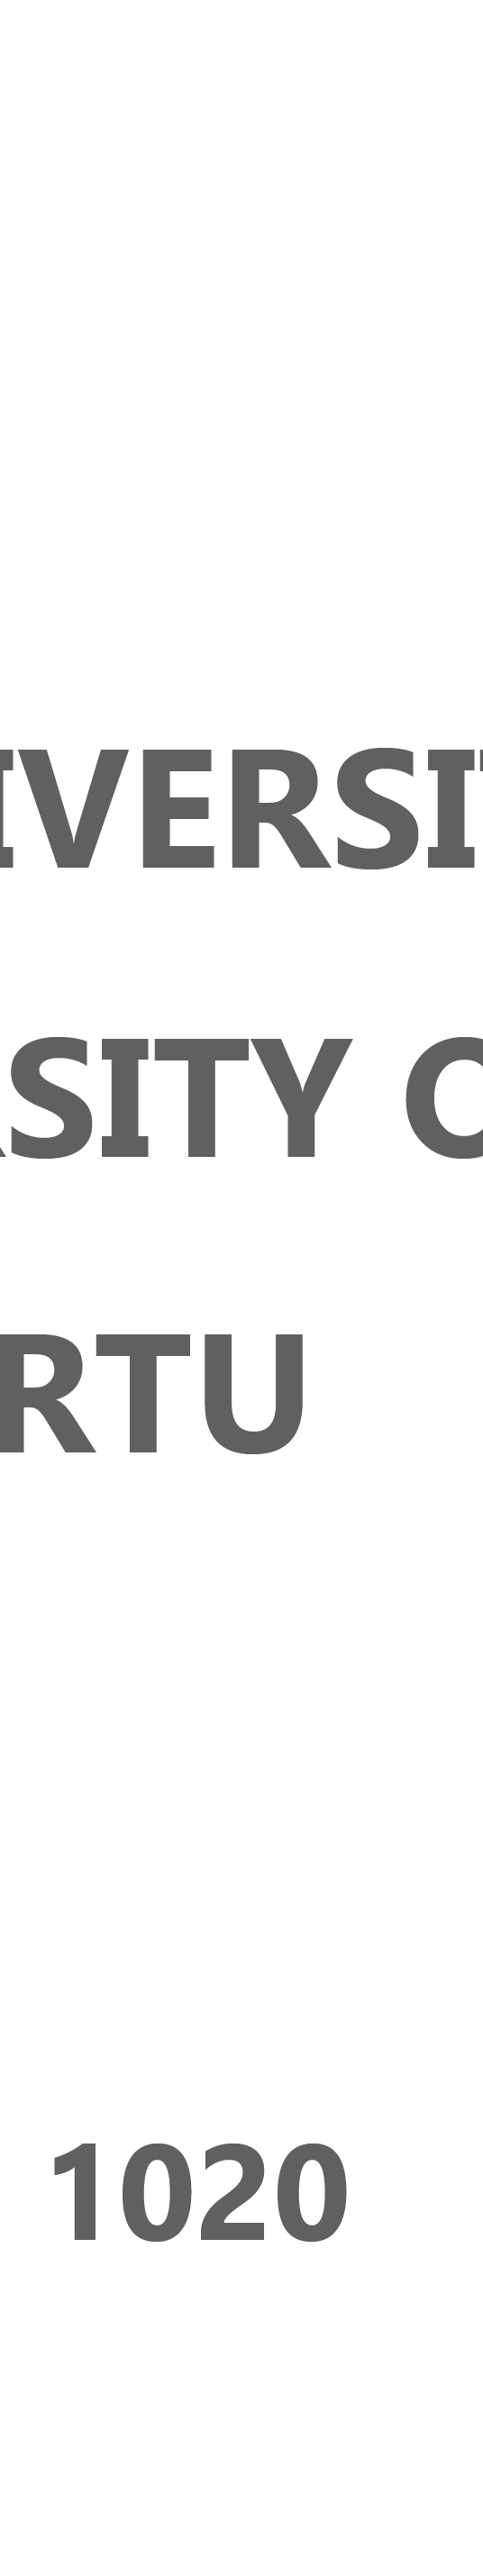 Collaborational Meeting of Three Universities